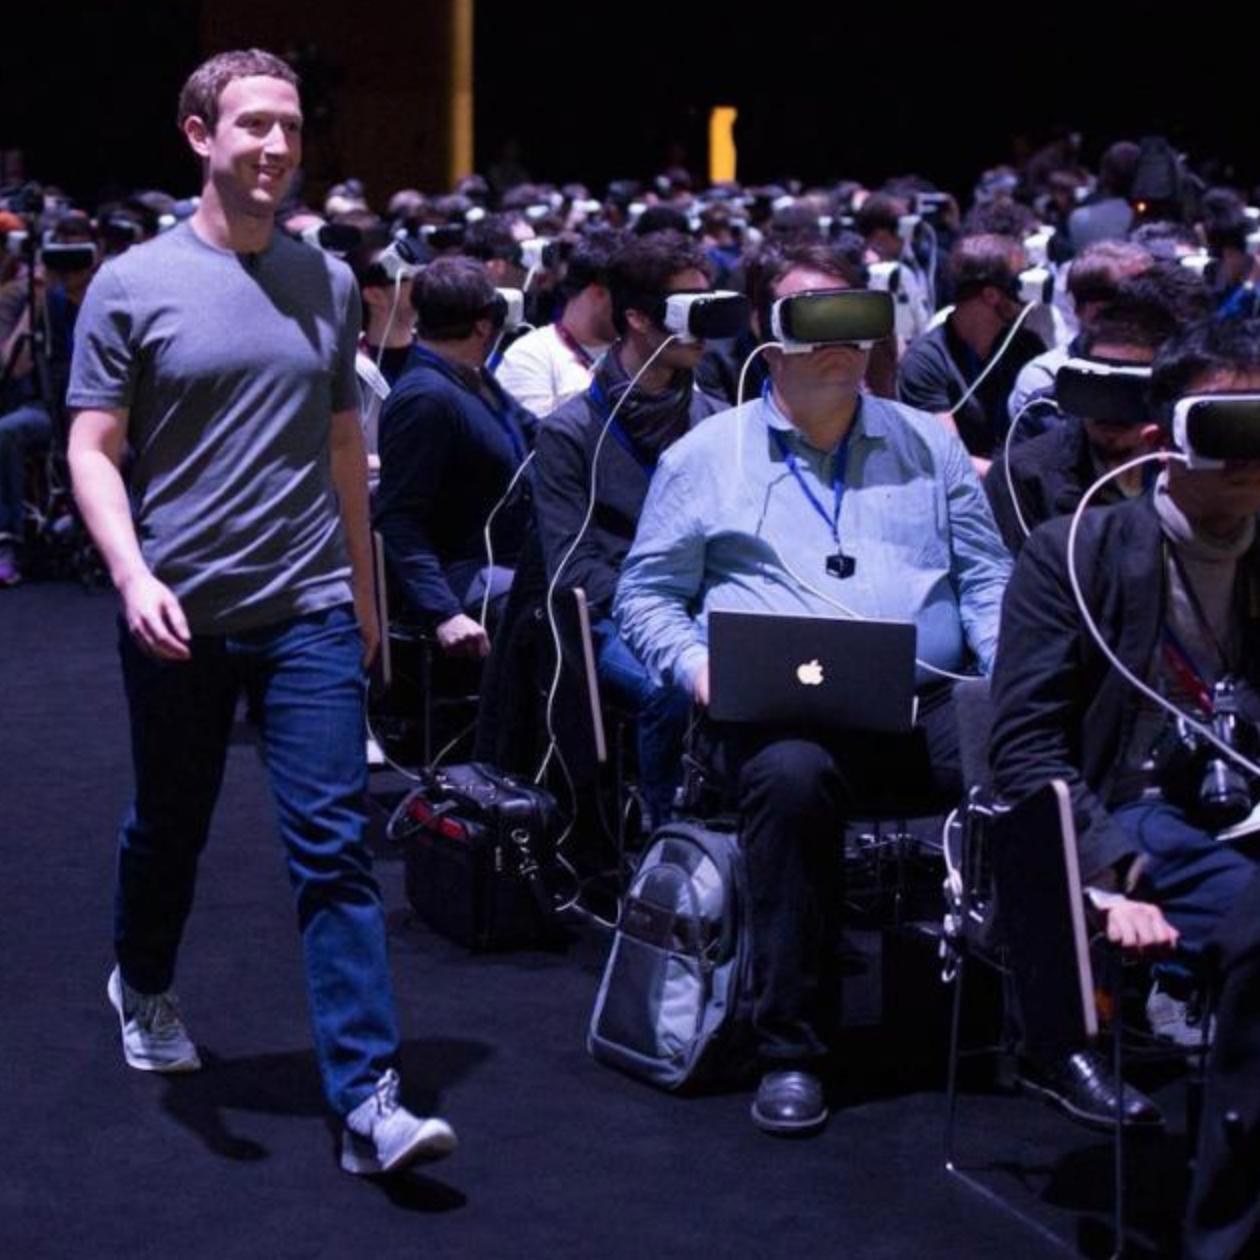 Mark Zuckerberg Has A Plan To Bring Facebook Users Into Virtual Reality